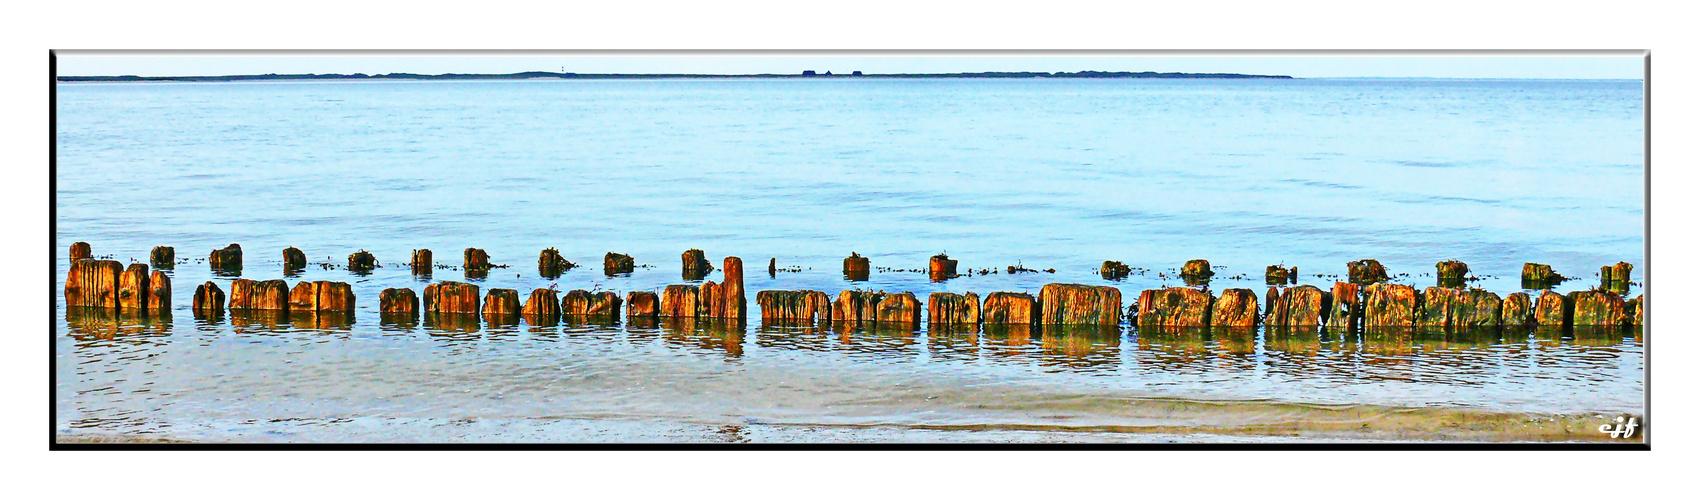 Buhnenreste im Wattenmeer